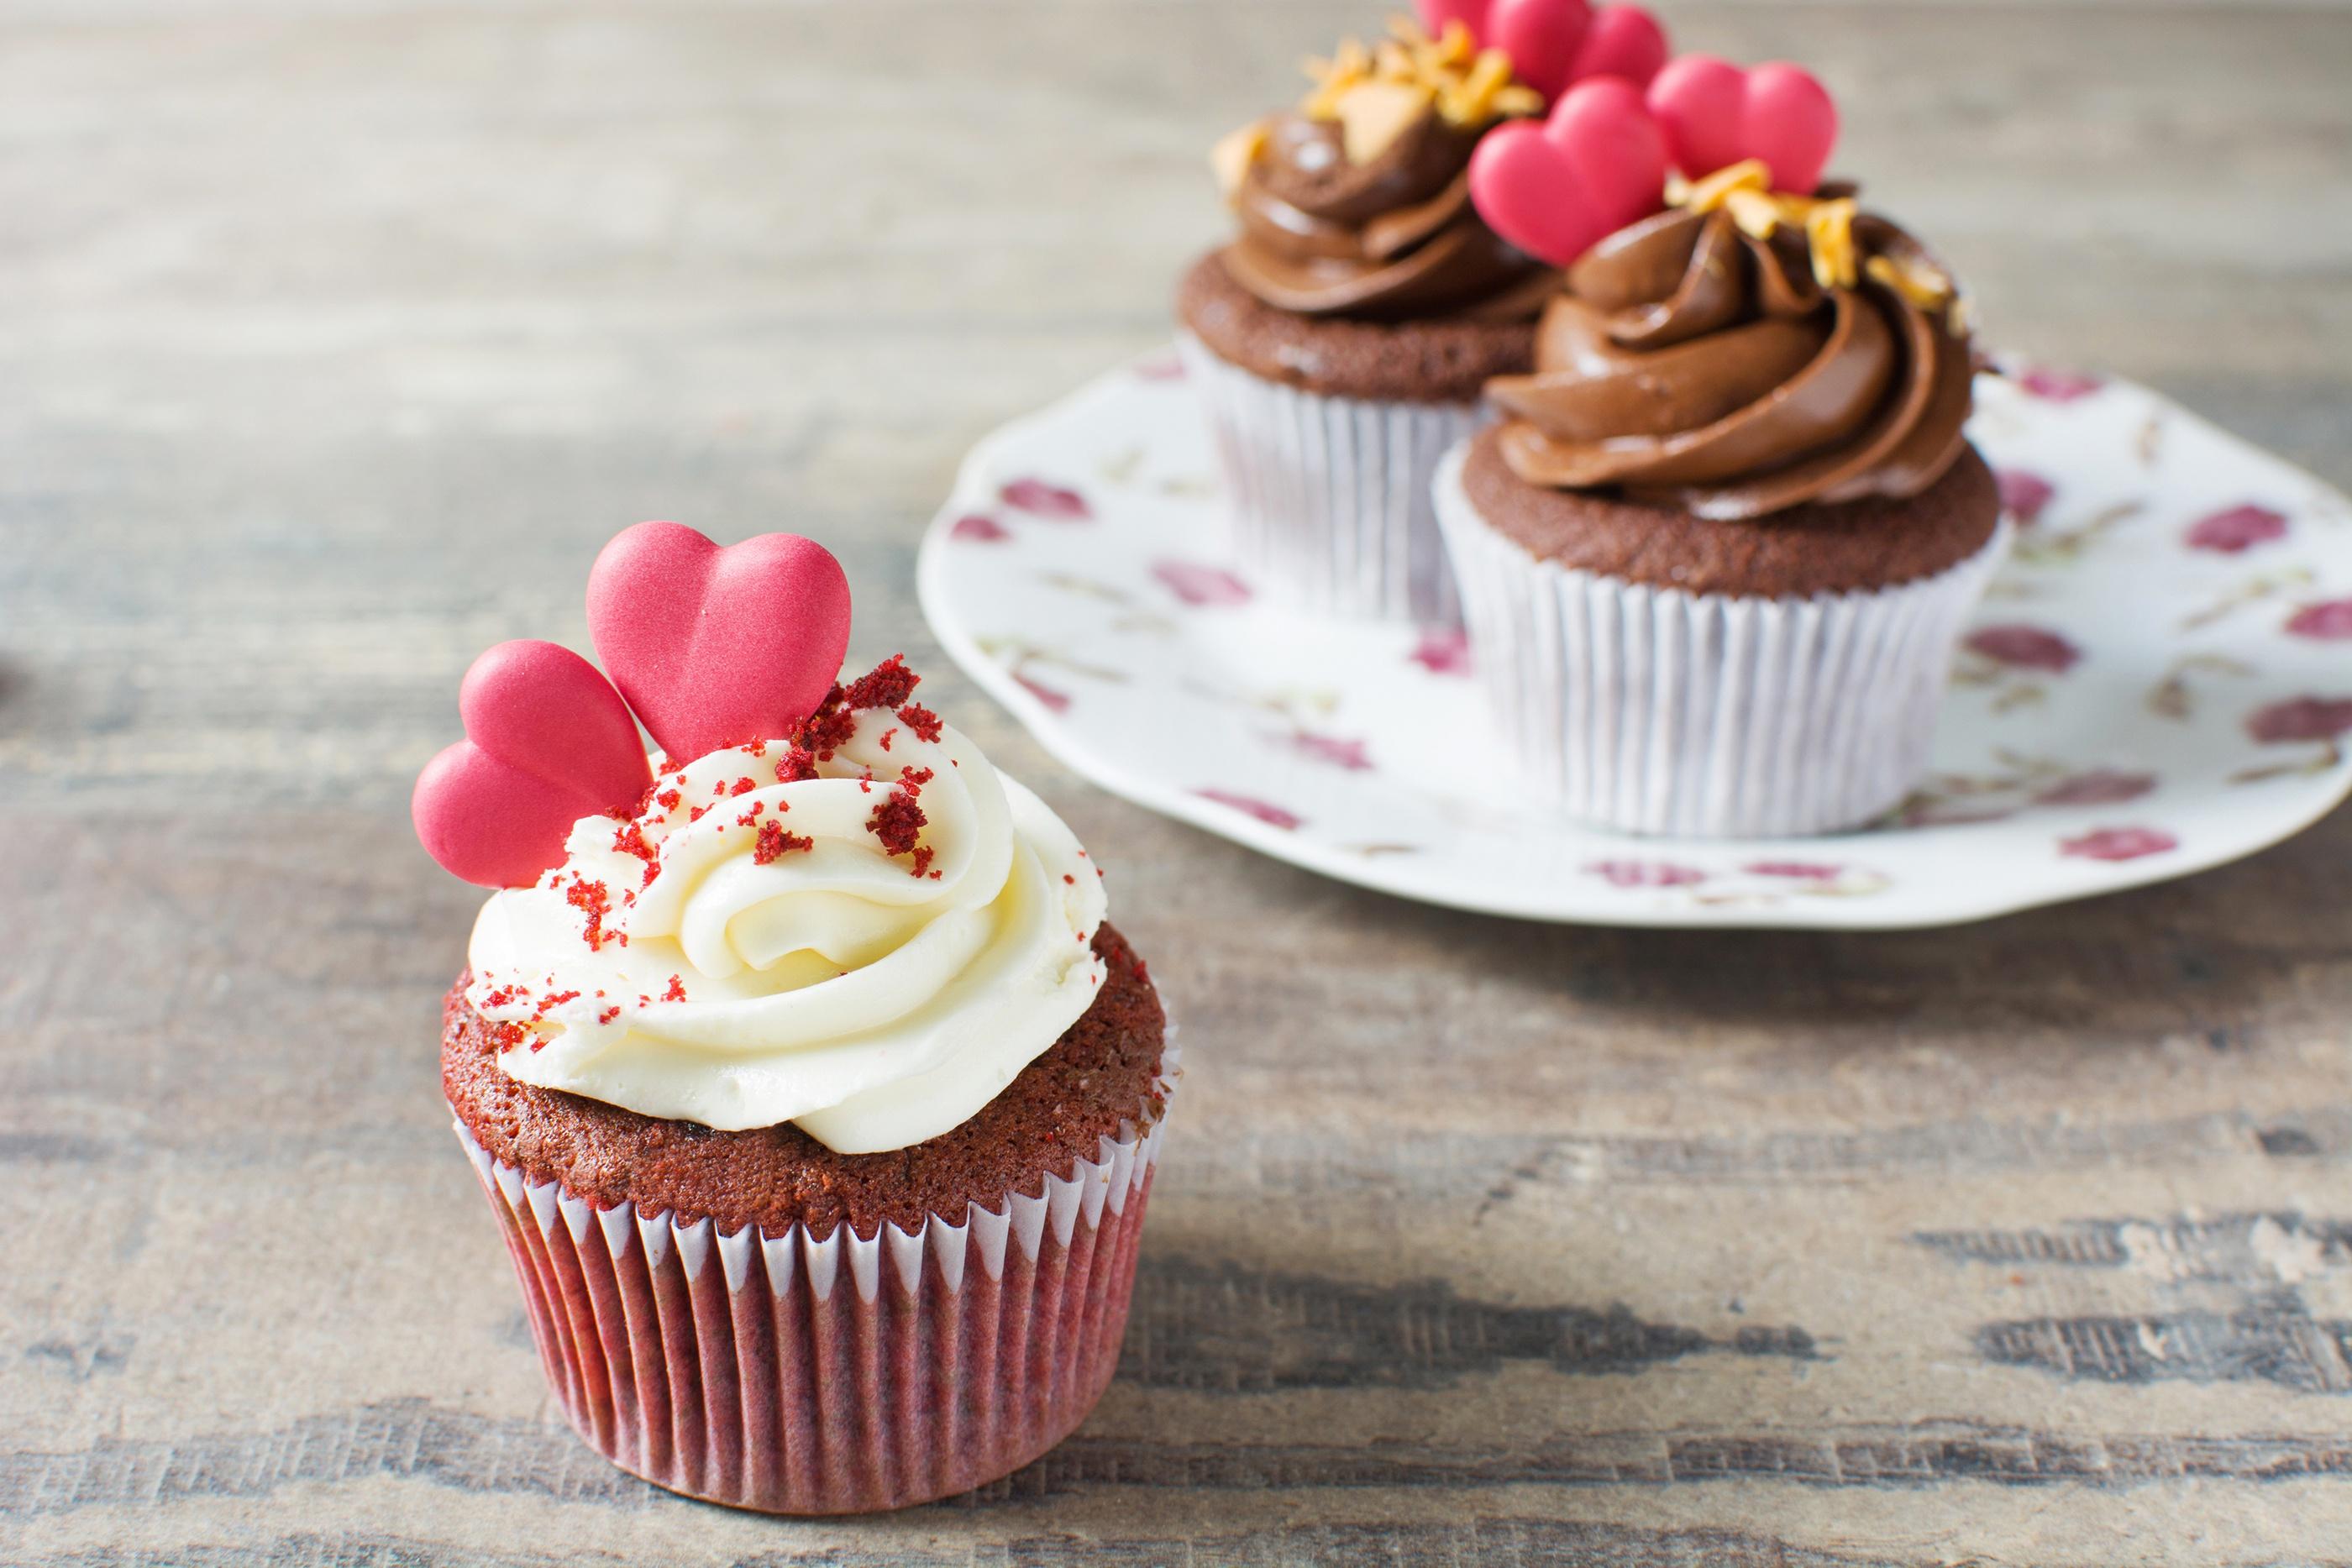 Cupcake Still Life Sweets 2800x1867